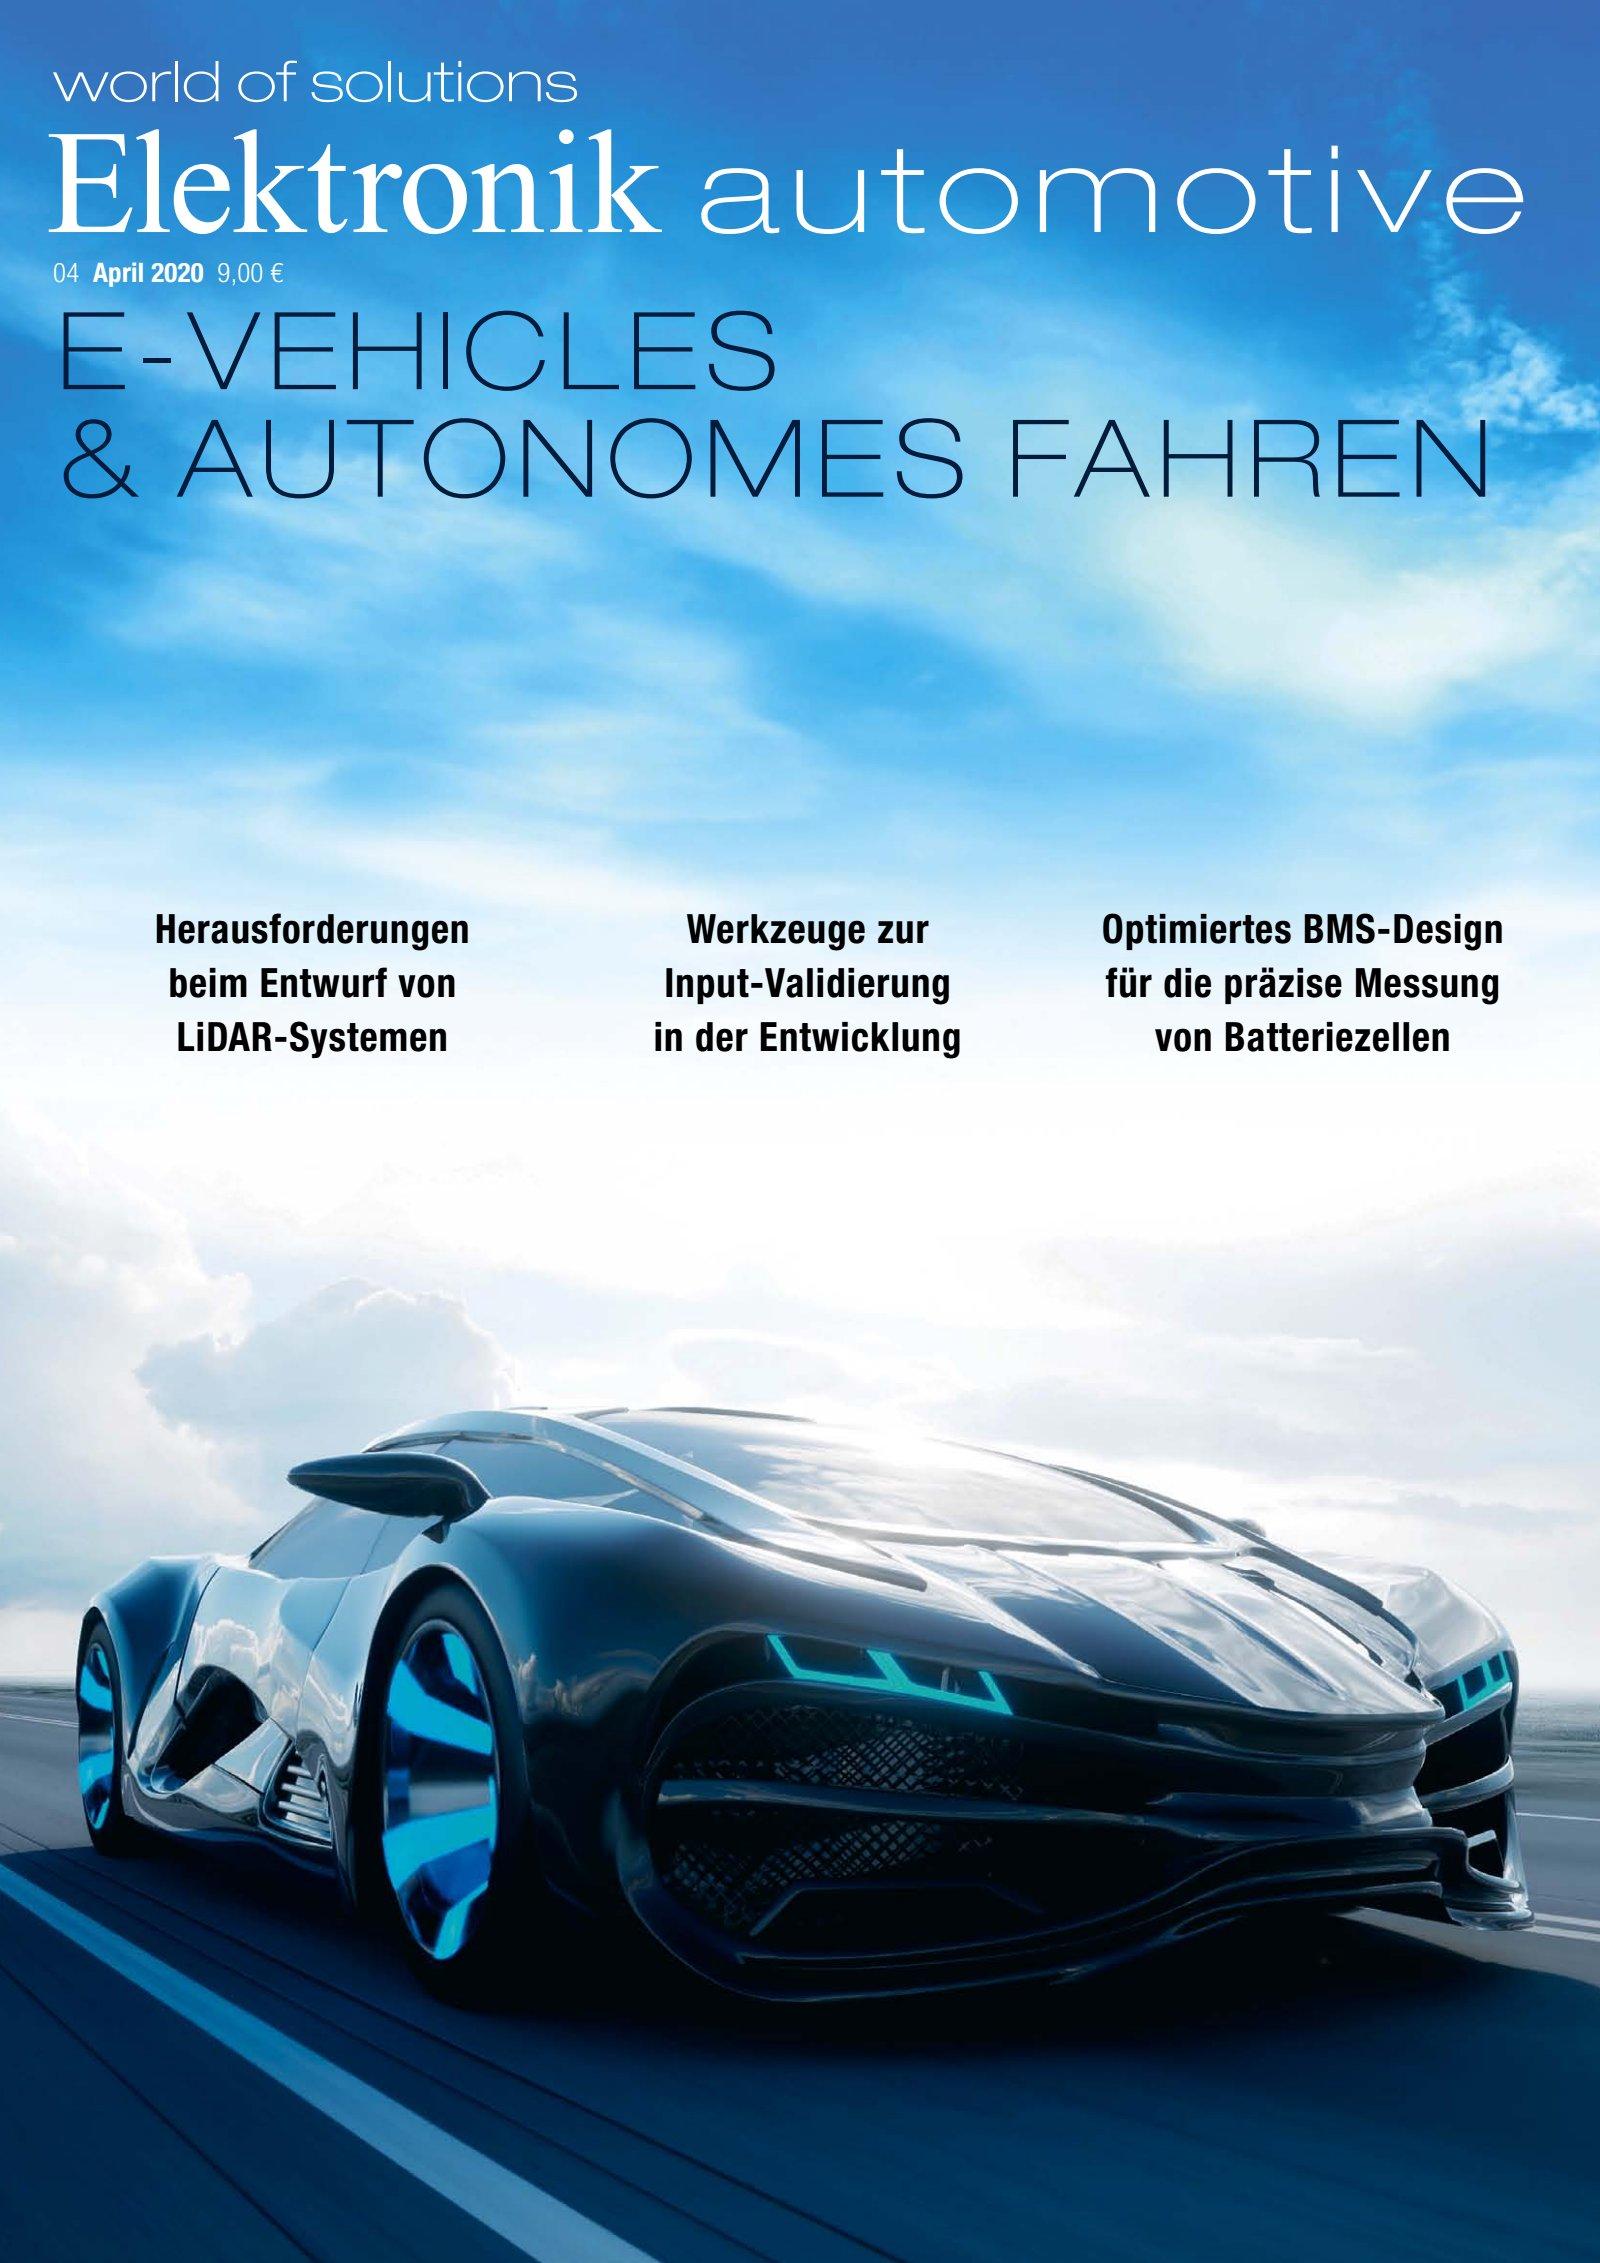 Elektronik automotive 04/2020 Digital